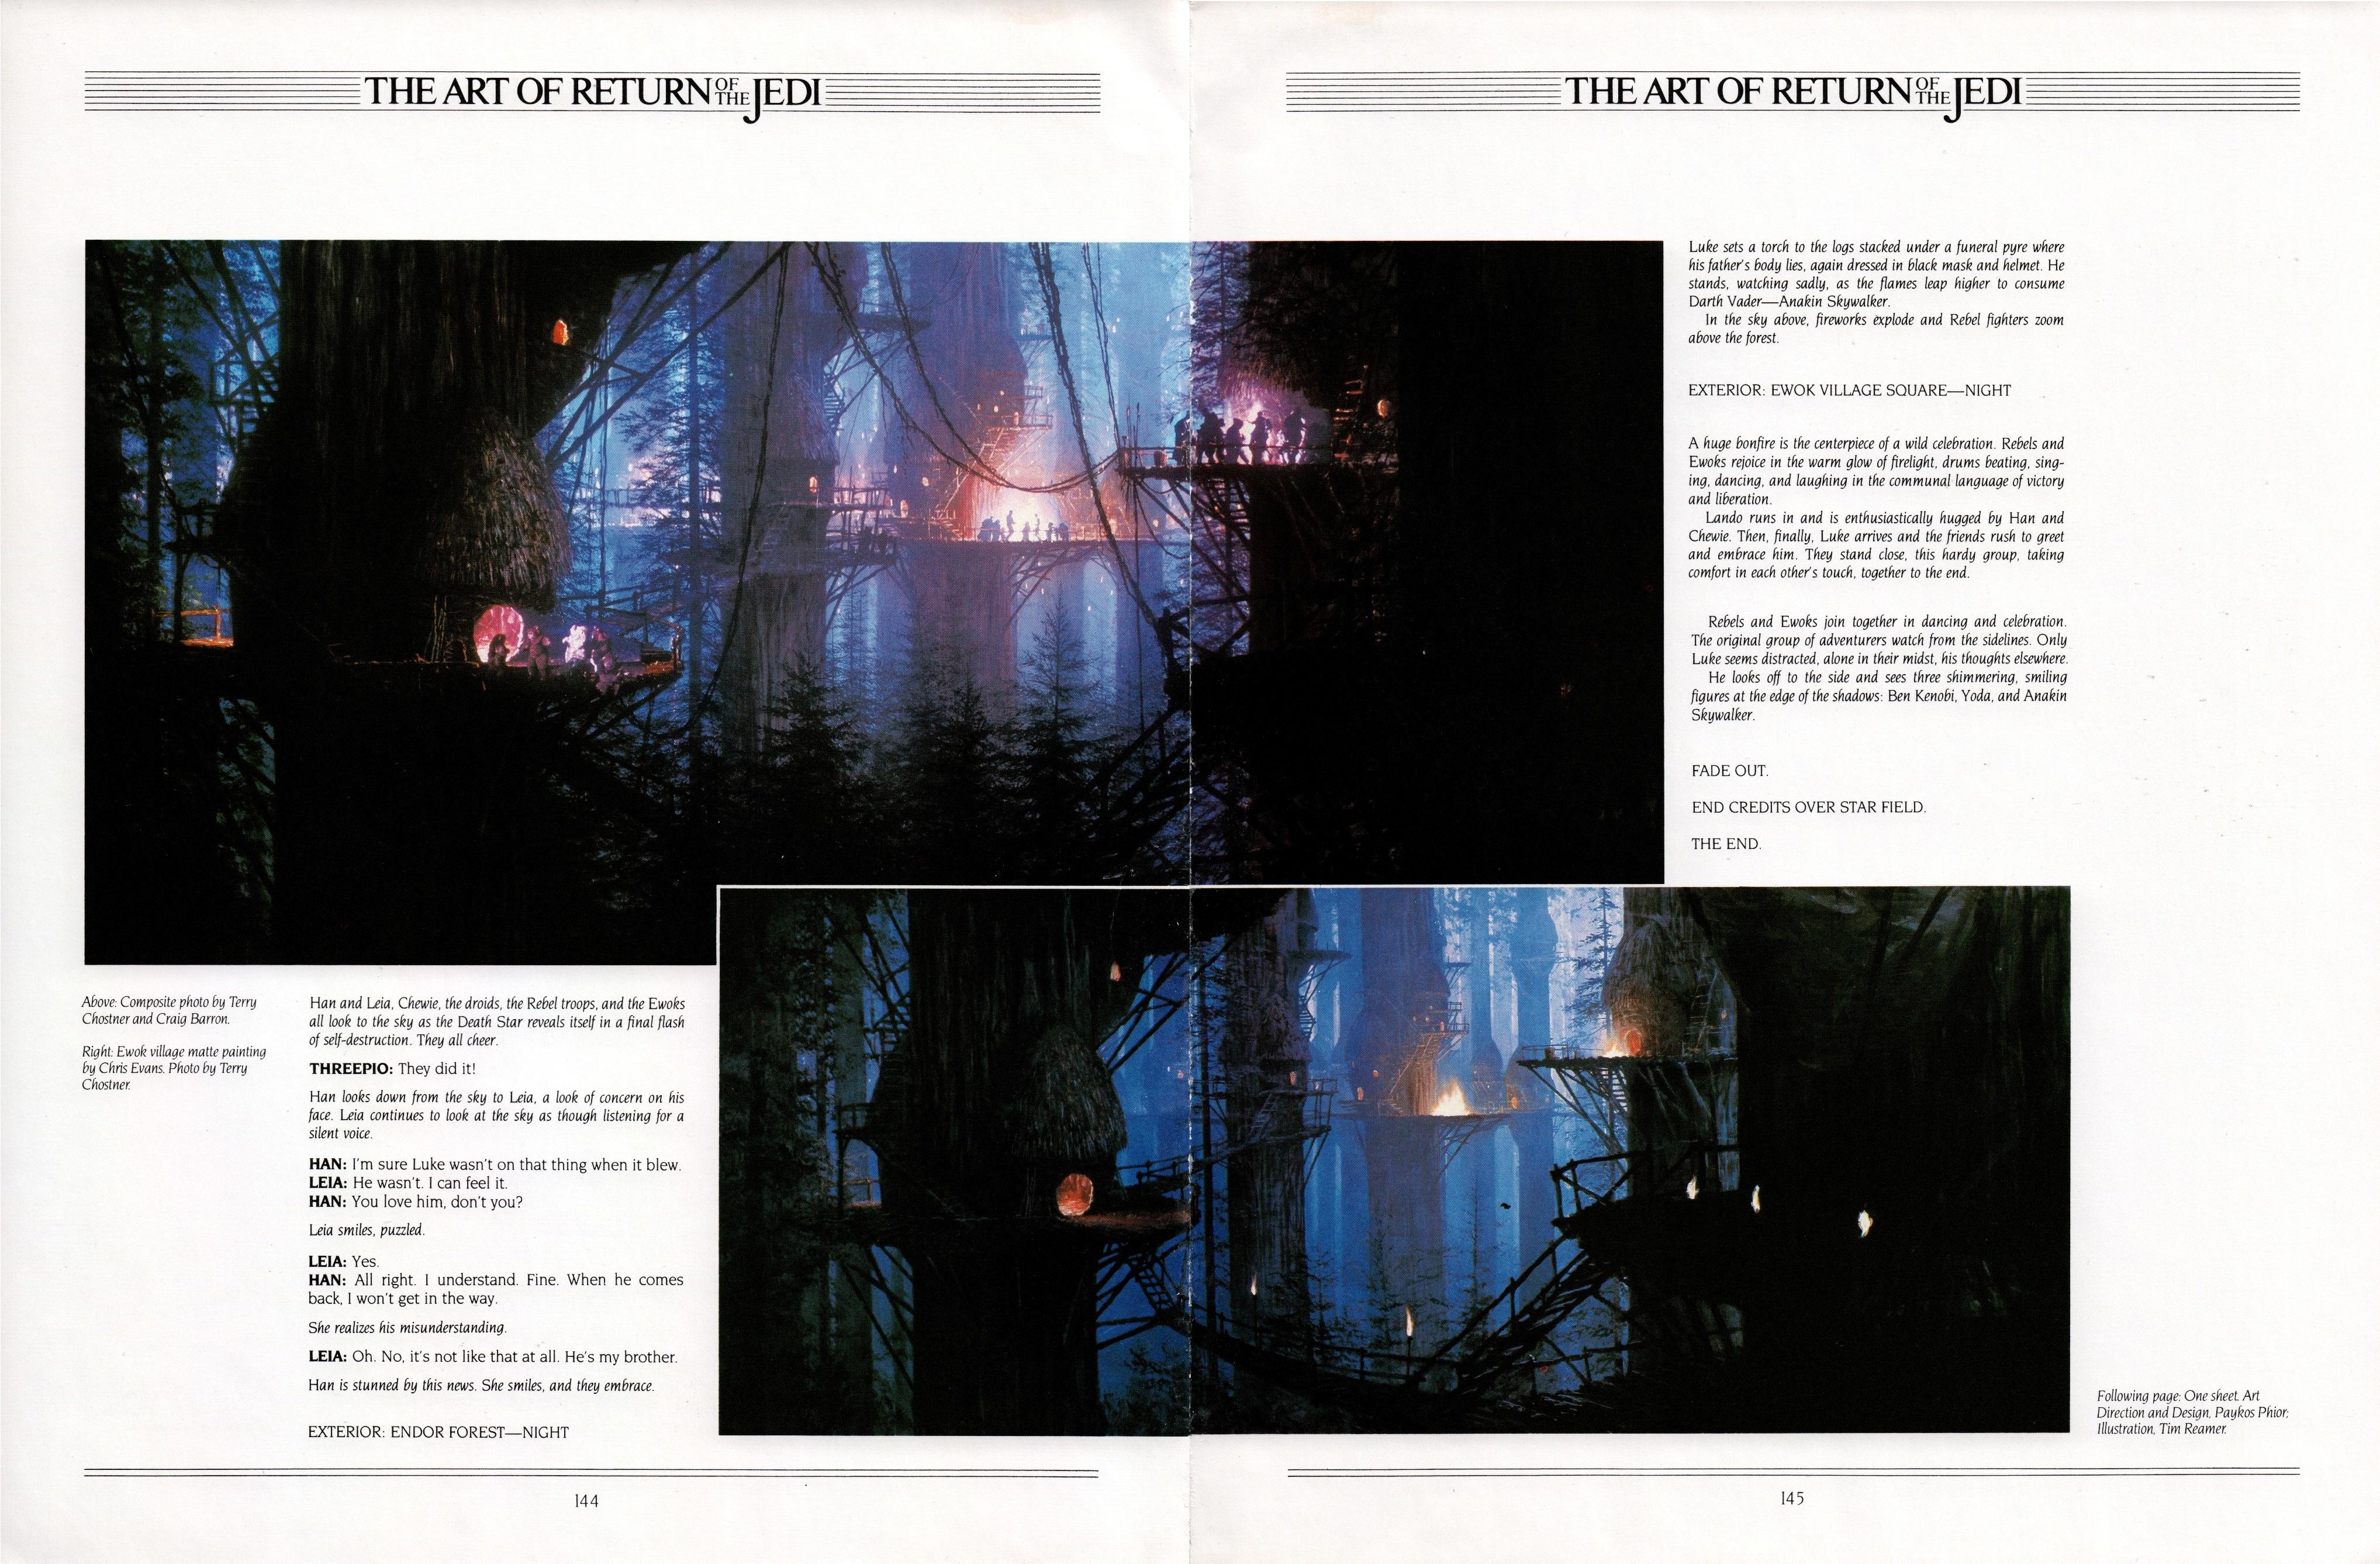 Art of Return of the Jedi (b0bafett_Empire)-p144-145